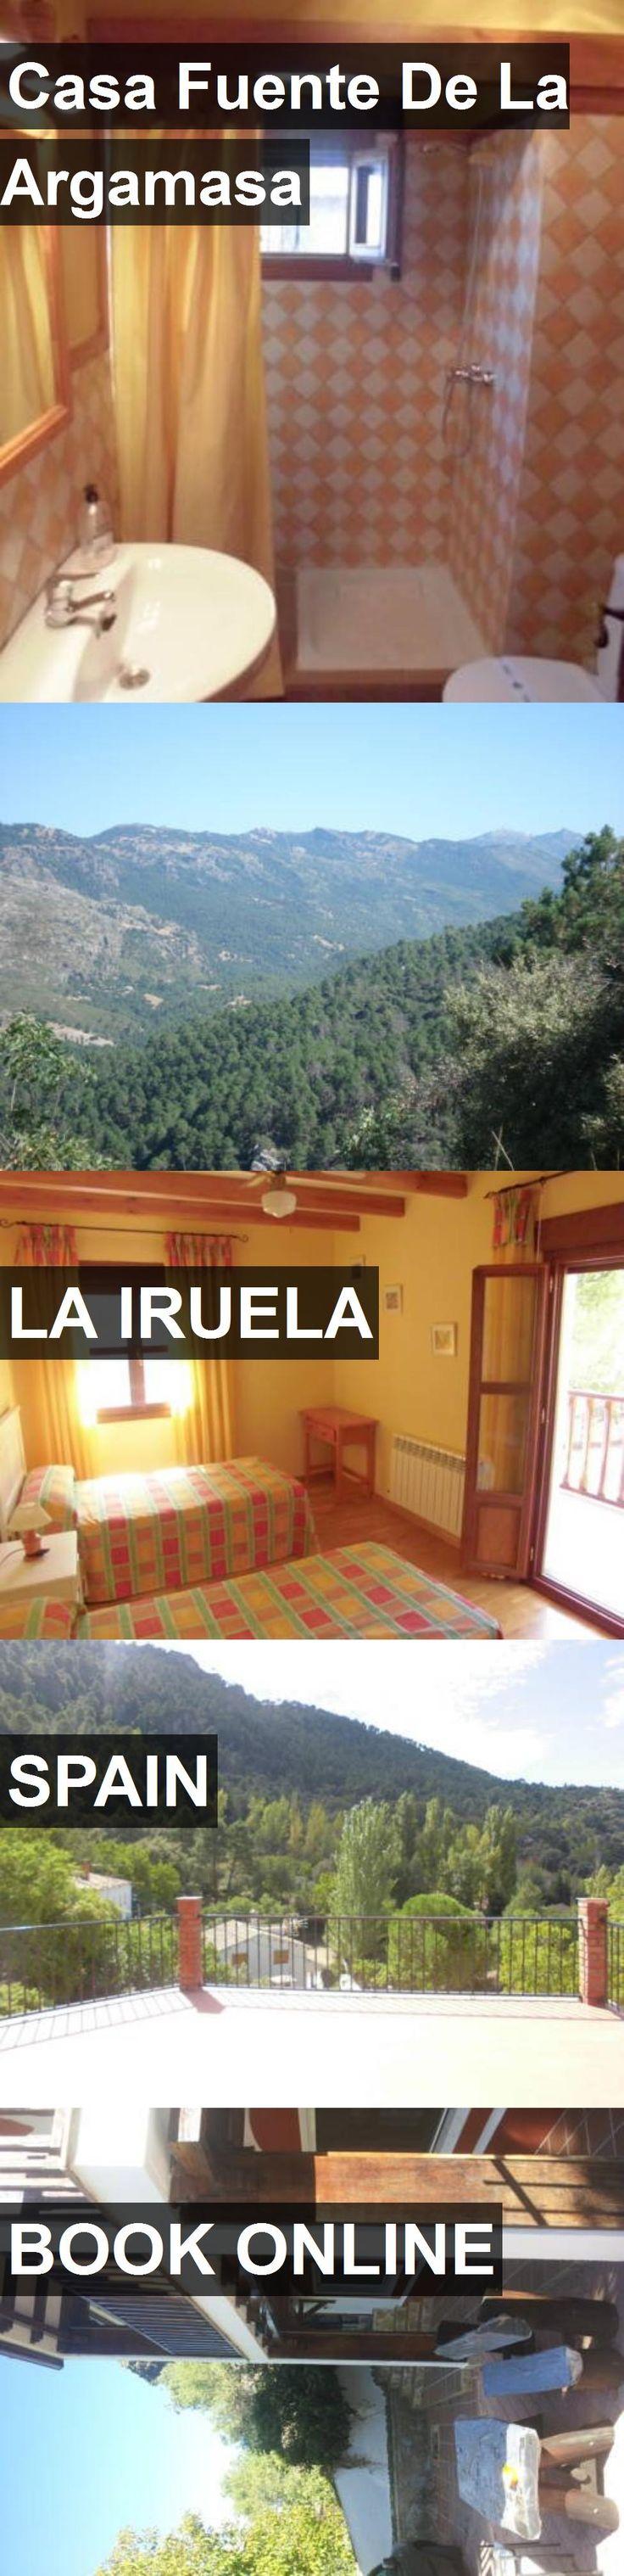 Hotel Casa Fuente De La Argamasa in La Iruela, Spain. For more information, photos, reviews and best prices please follow the link. #Spain #LaIruela #travel #vacation #hotel